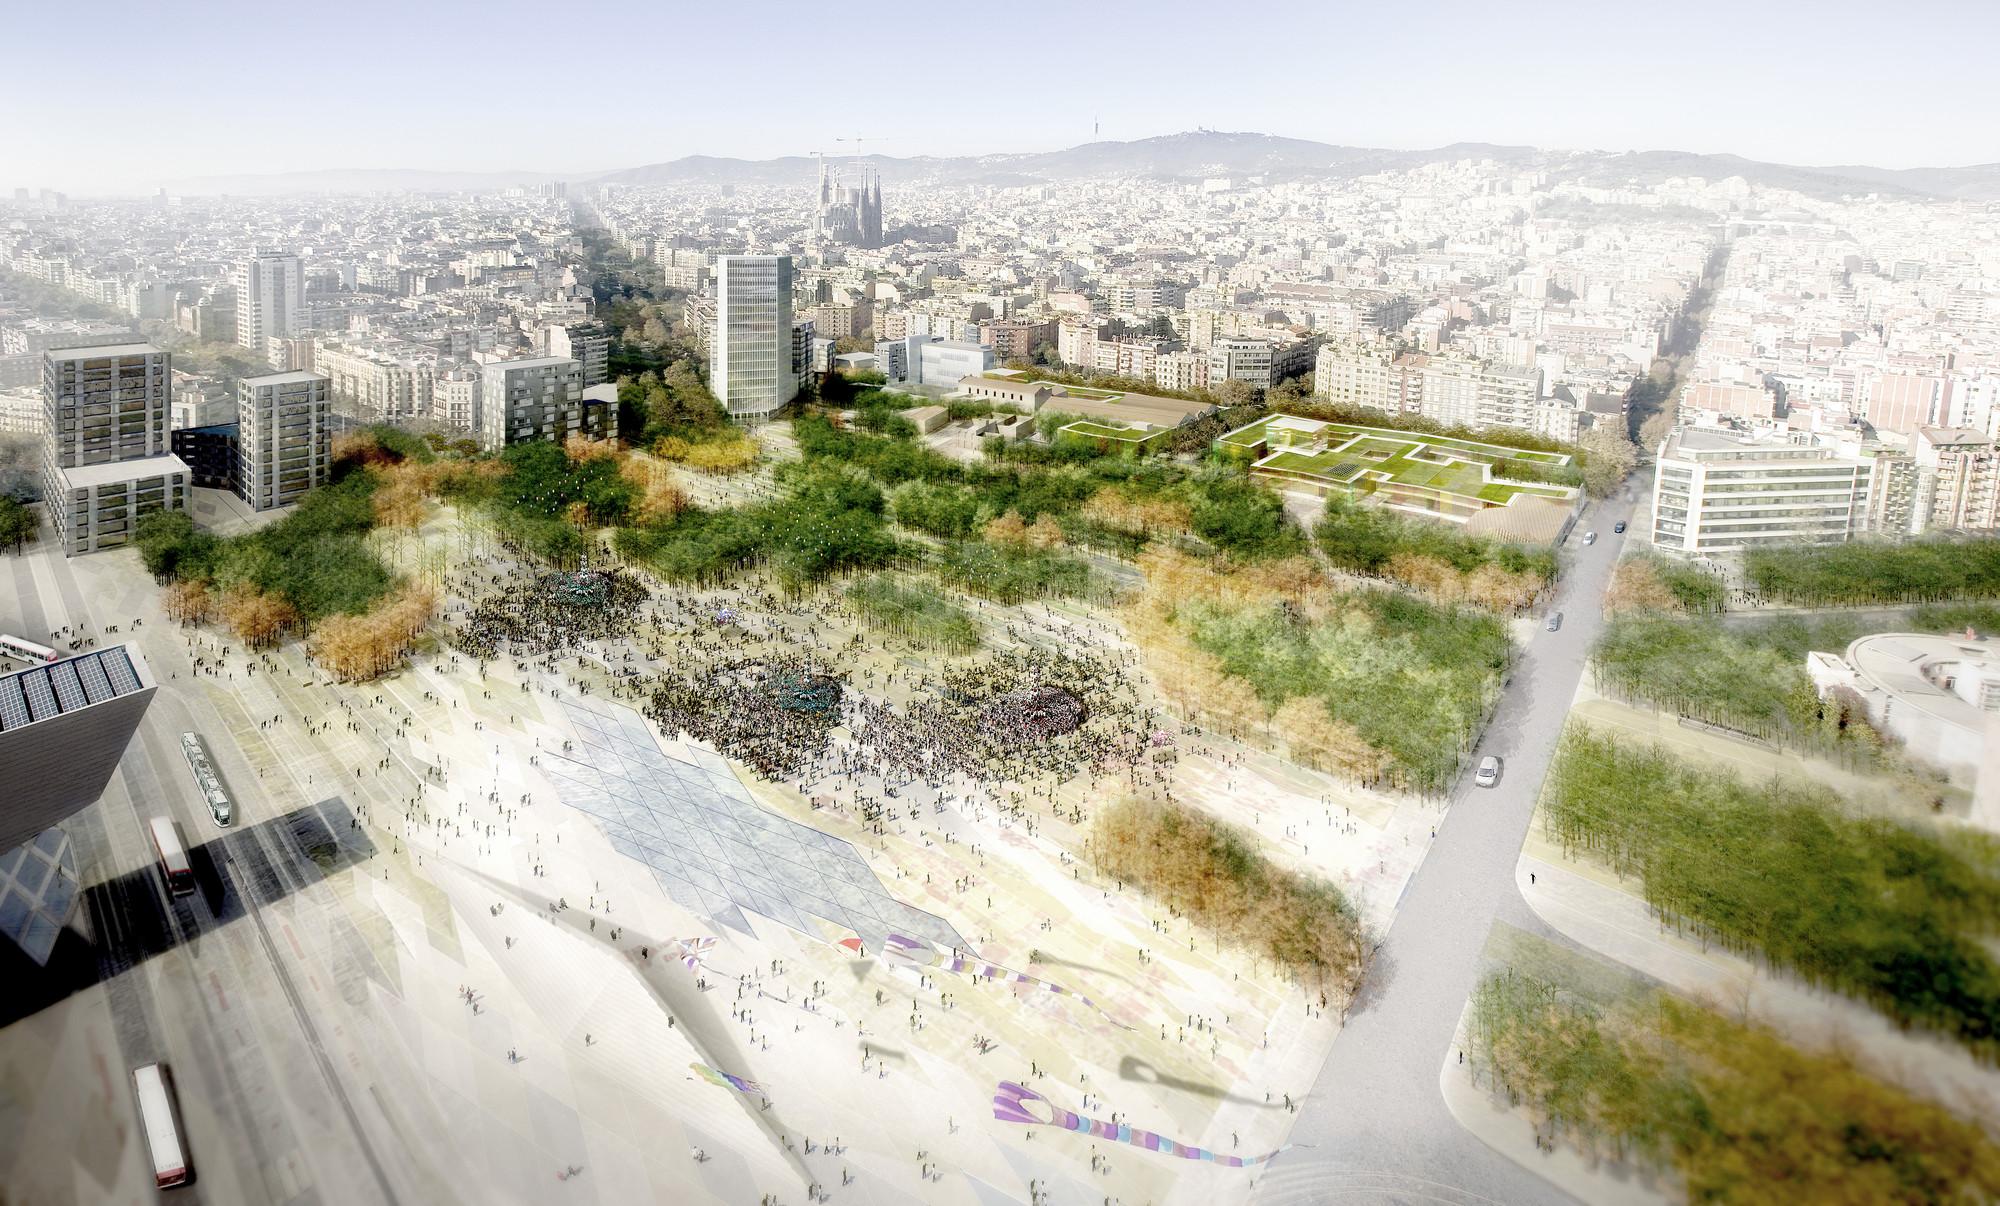 Mención Especial Concurso Plaza de les Glòries / Barcelona, España., Vista General. Image Courtesy of UTE Fuses Viader + Perea + Mansilla + Desvign